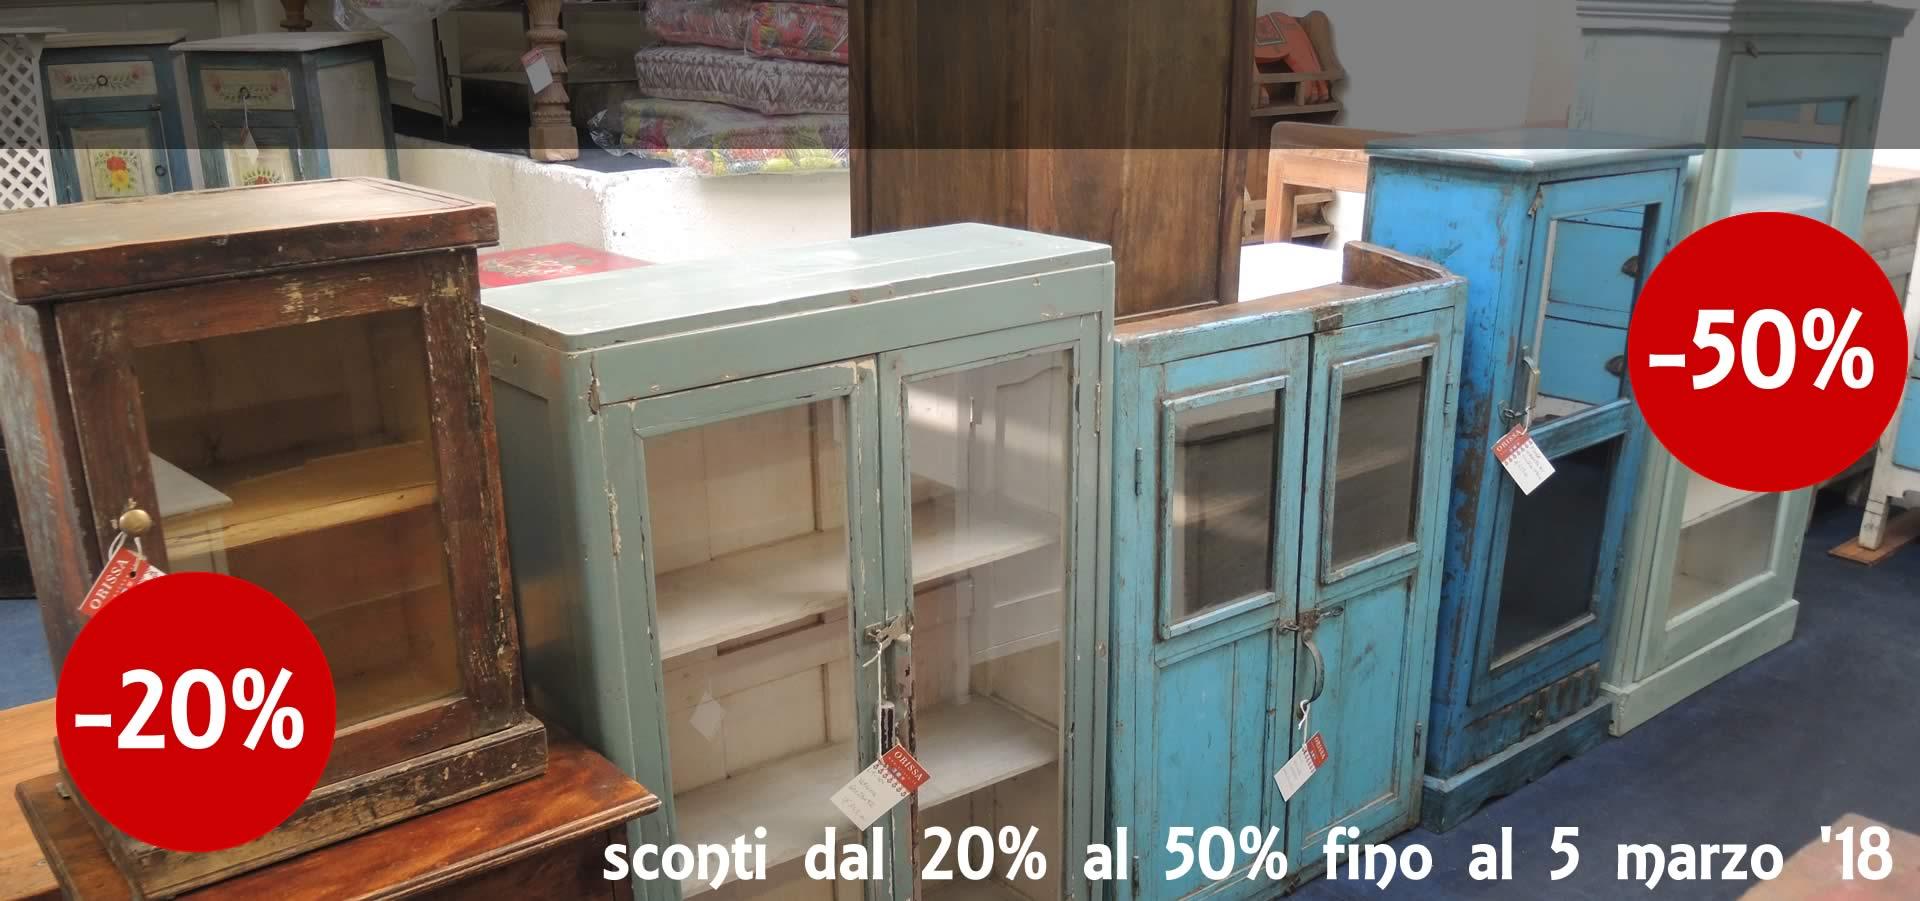 Mobili coloniali arredamento shabby chic etnico on line for Sconti mobili